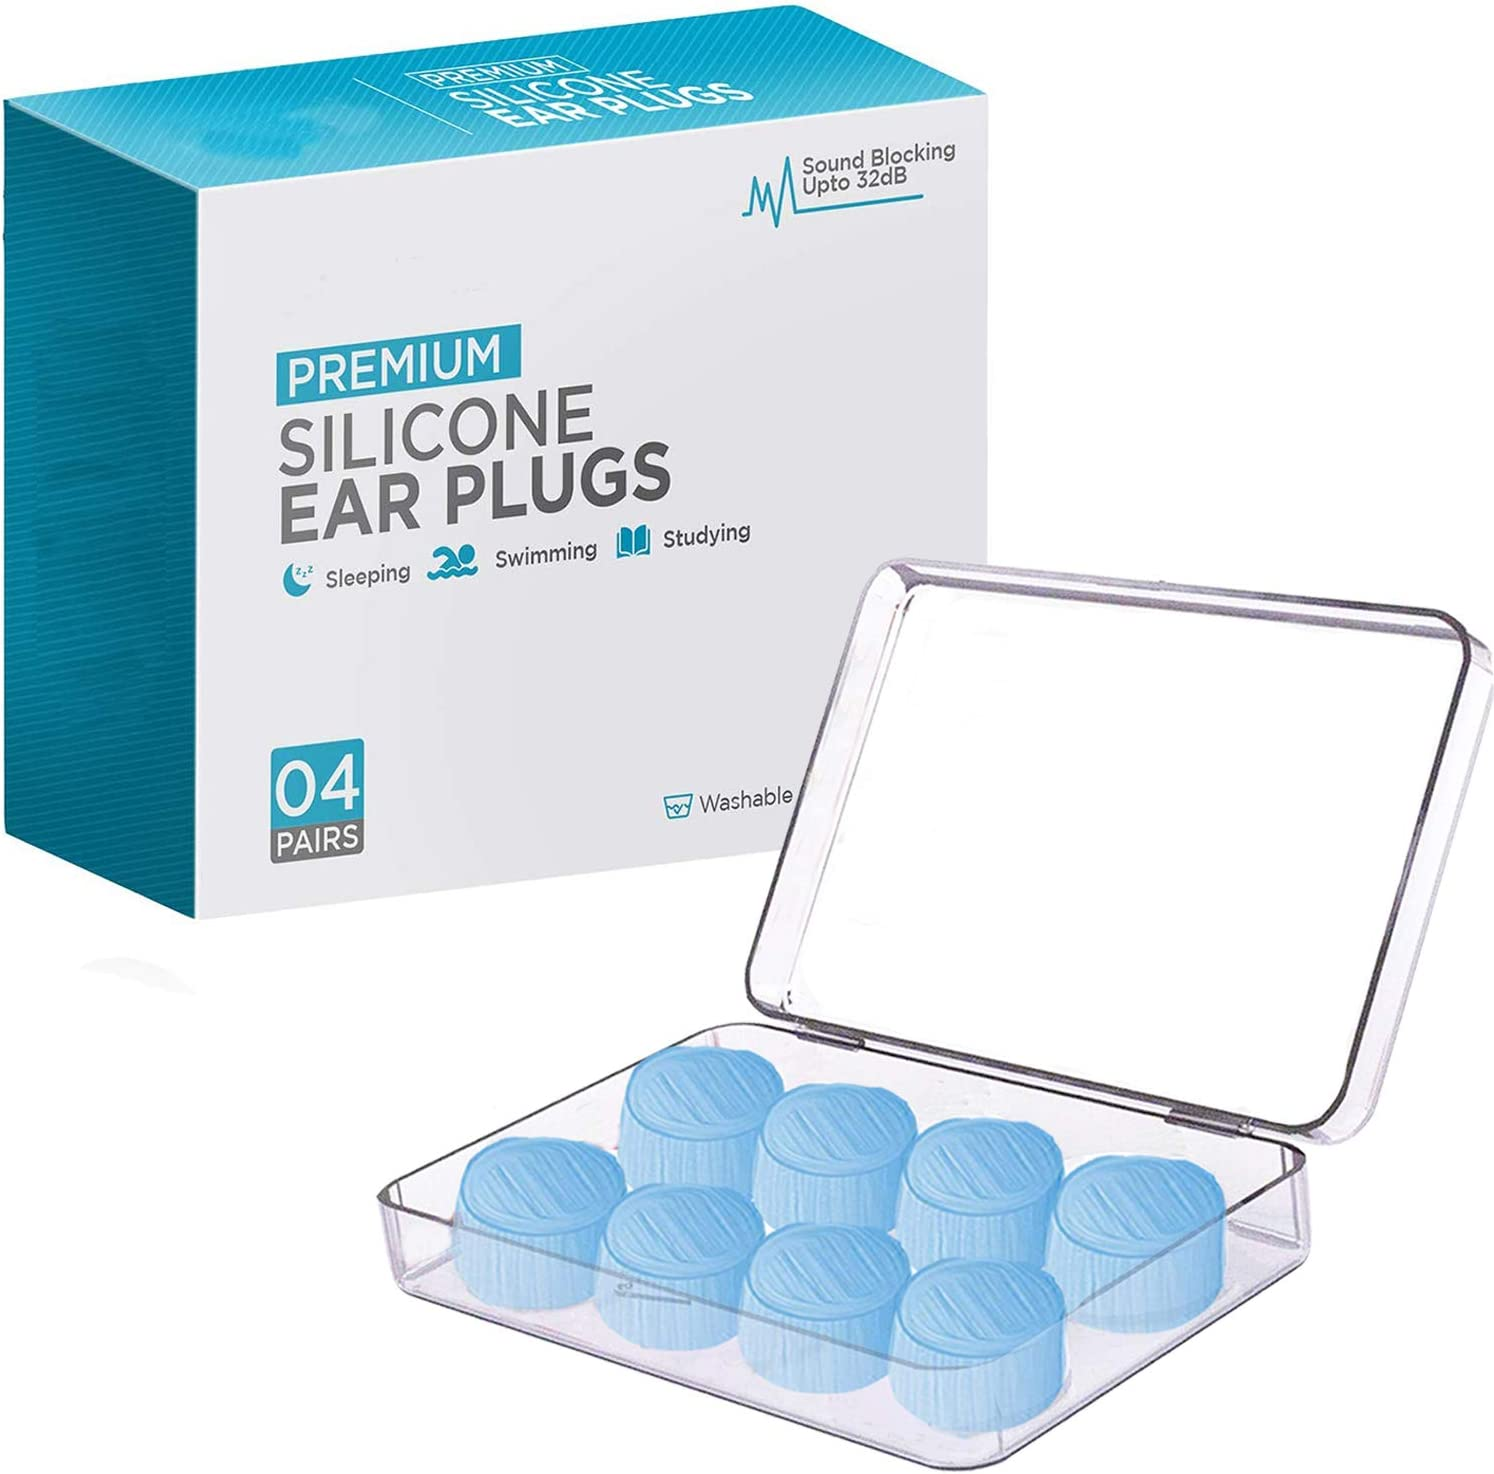 Soft Silicone Earplugs Reusable Ear Plugs Sleep Swimming Work Noise Nice a!